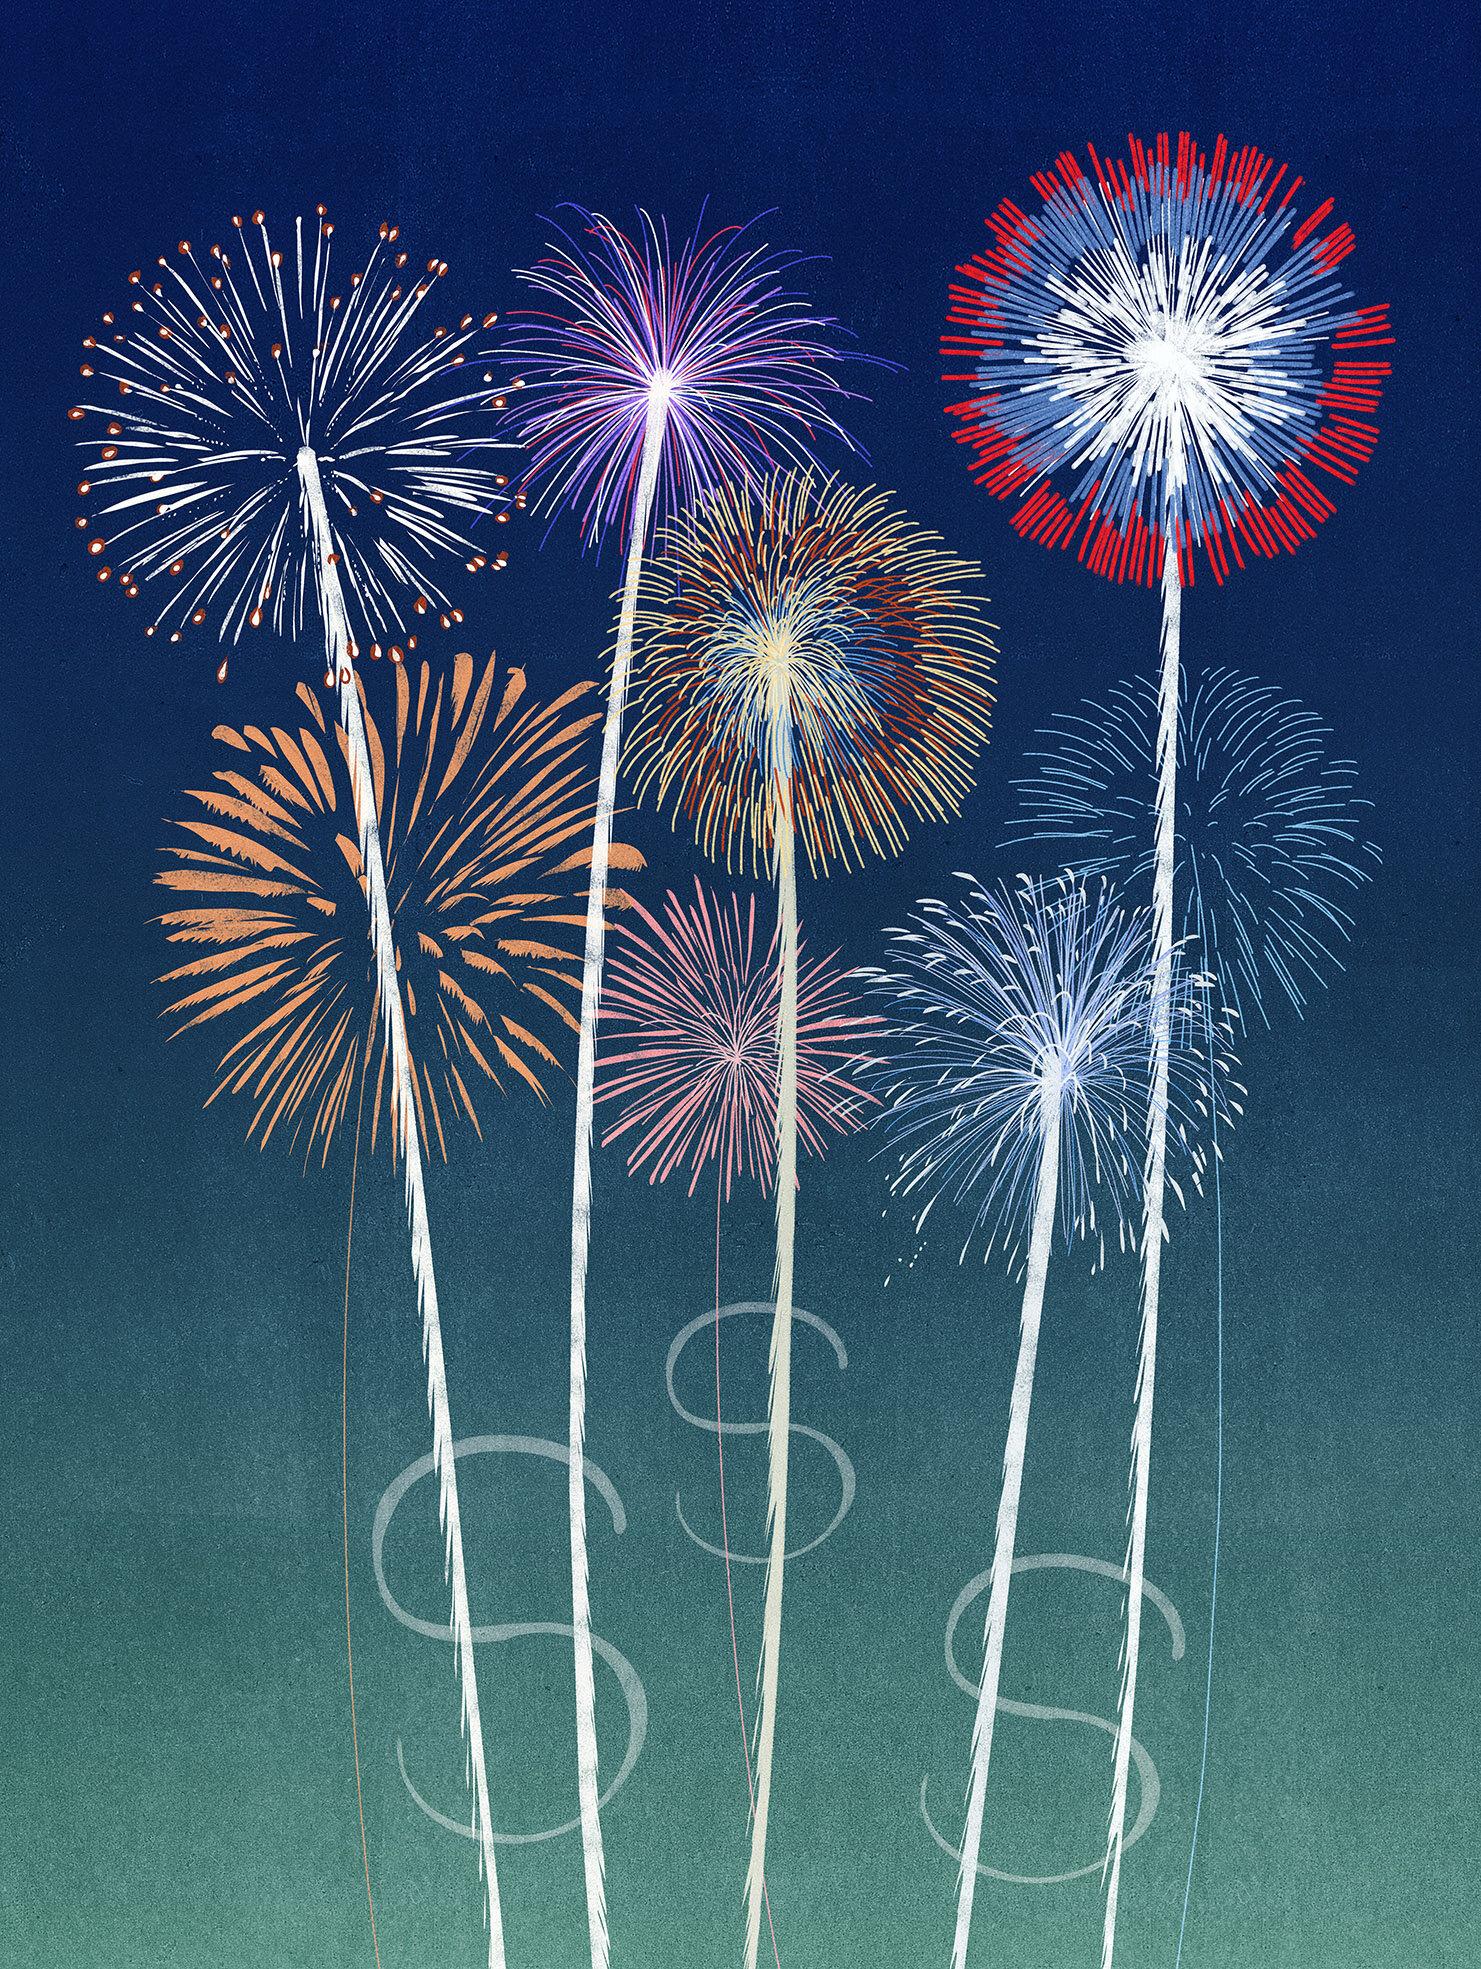 Thrivent - Financial fireworks